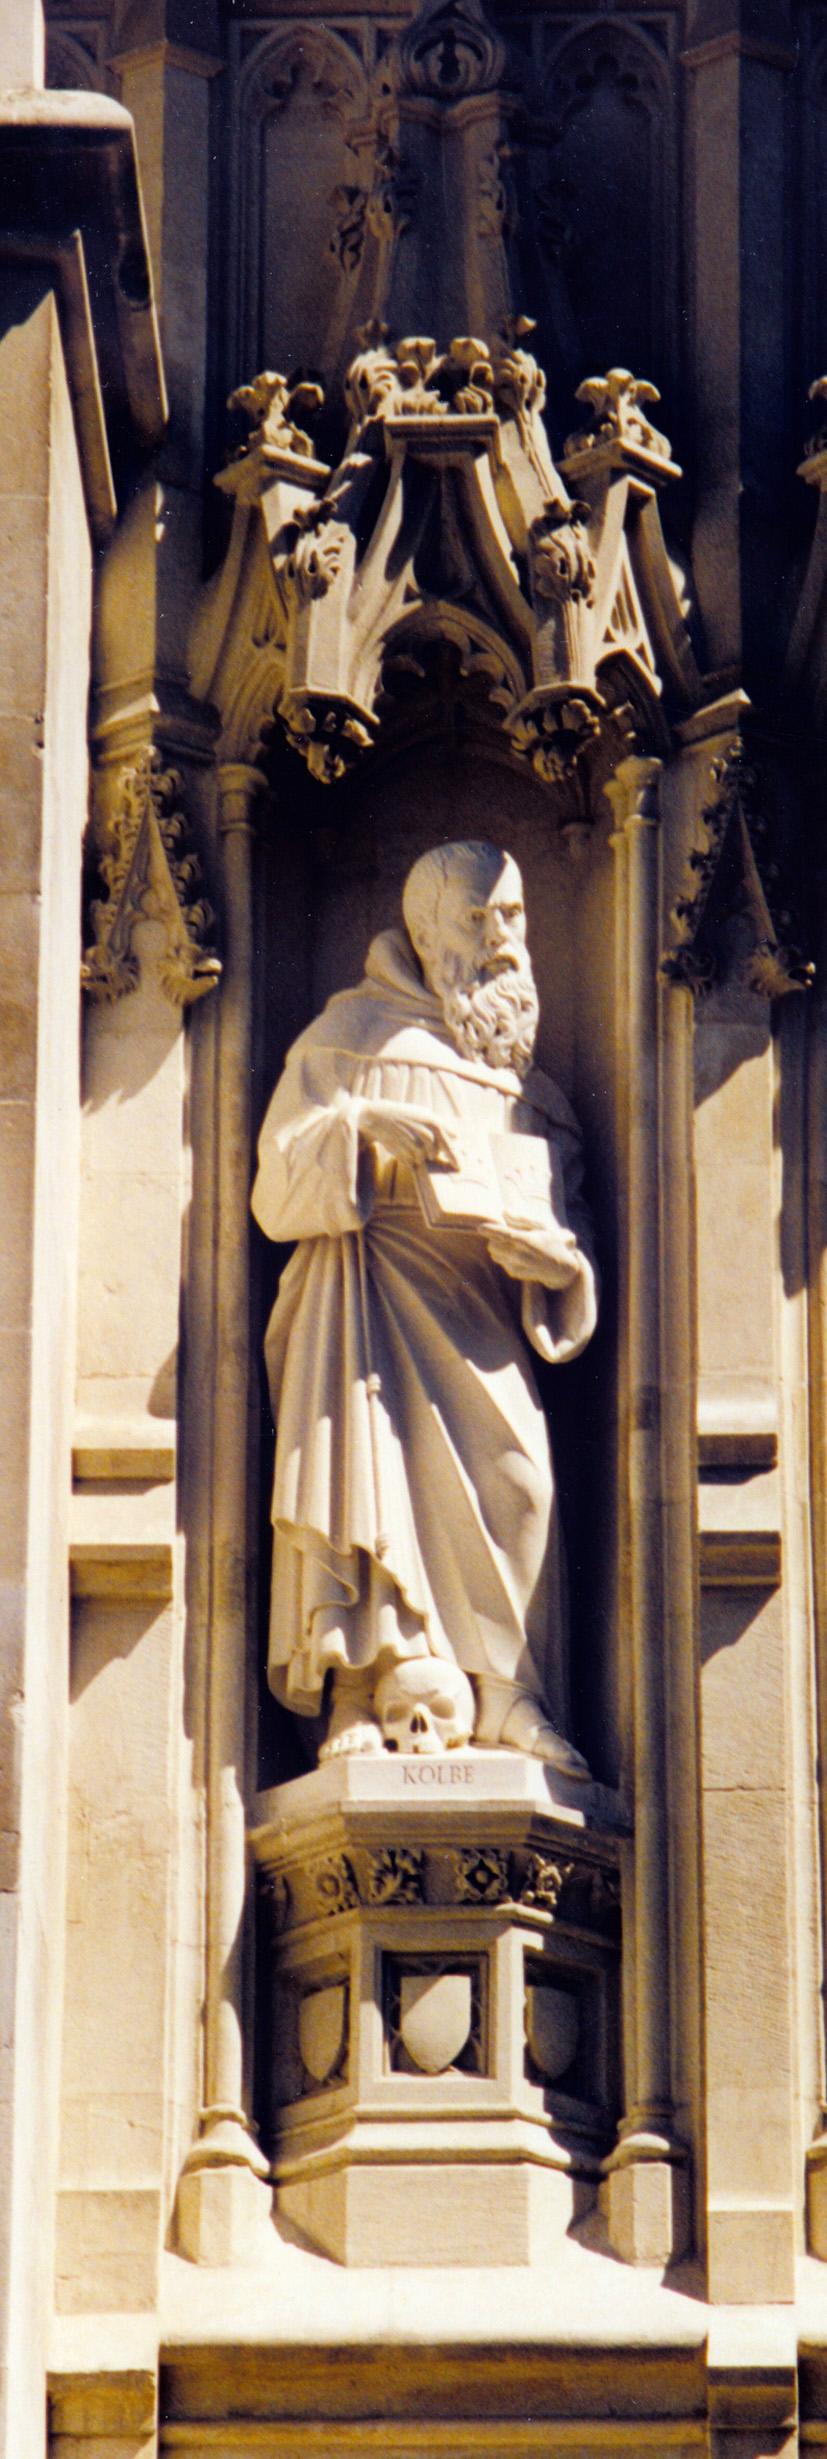 Maximilian Kolbe Westminster Abbey modern martyr